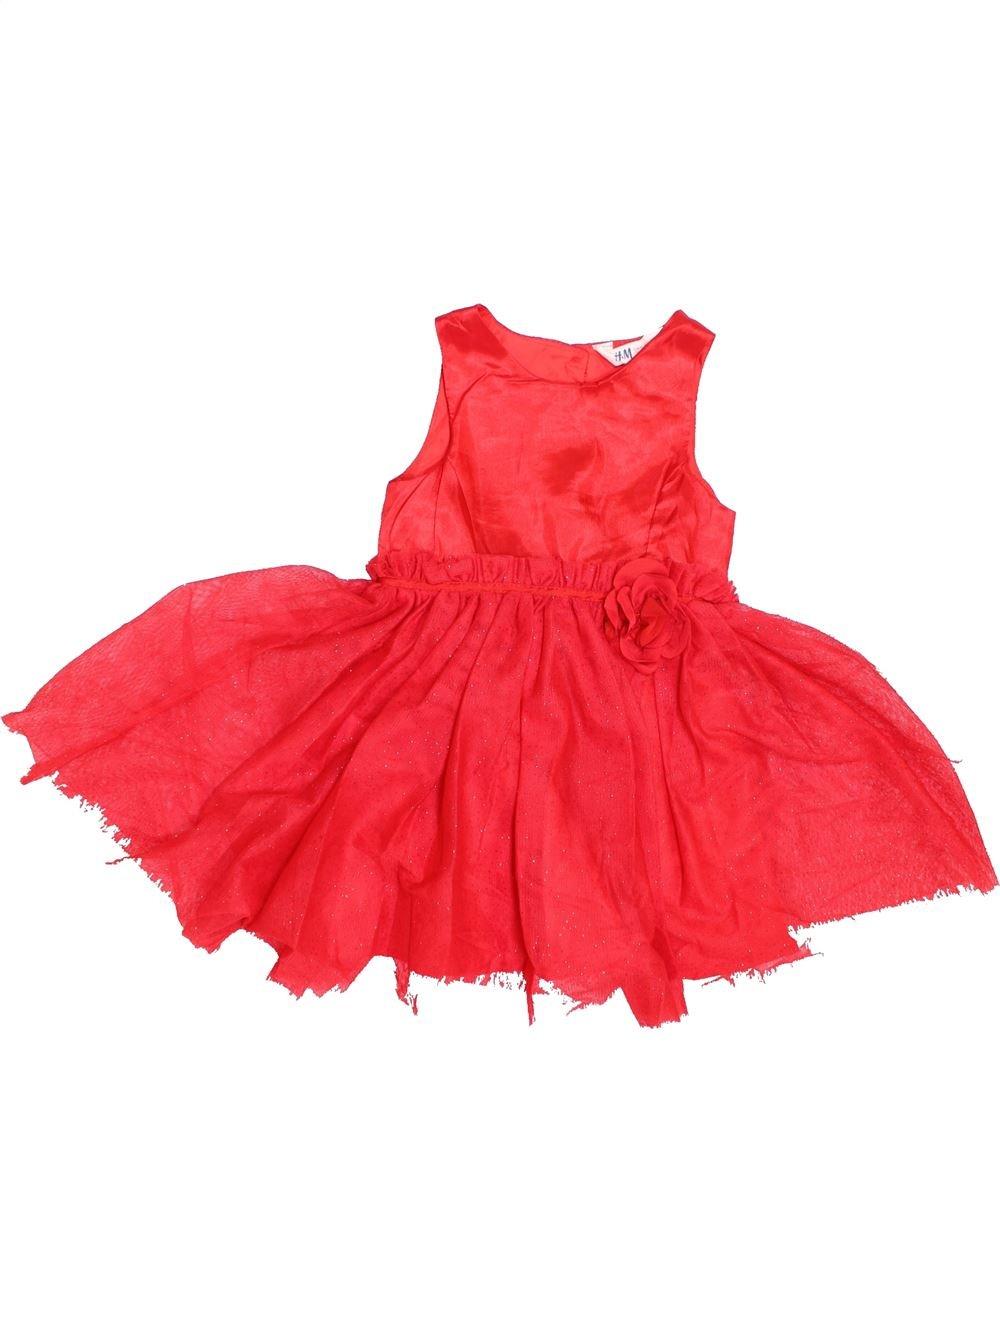 Robe Fille H M 2 Ans Pas Cher 7 49 1424116